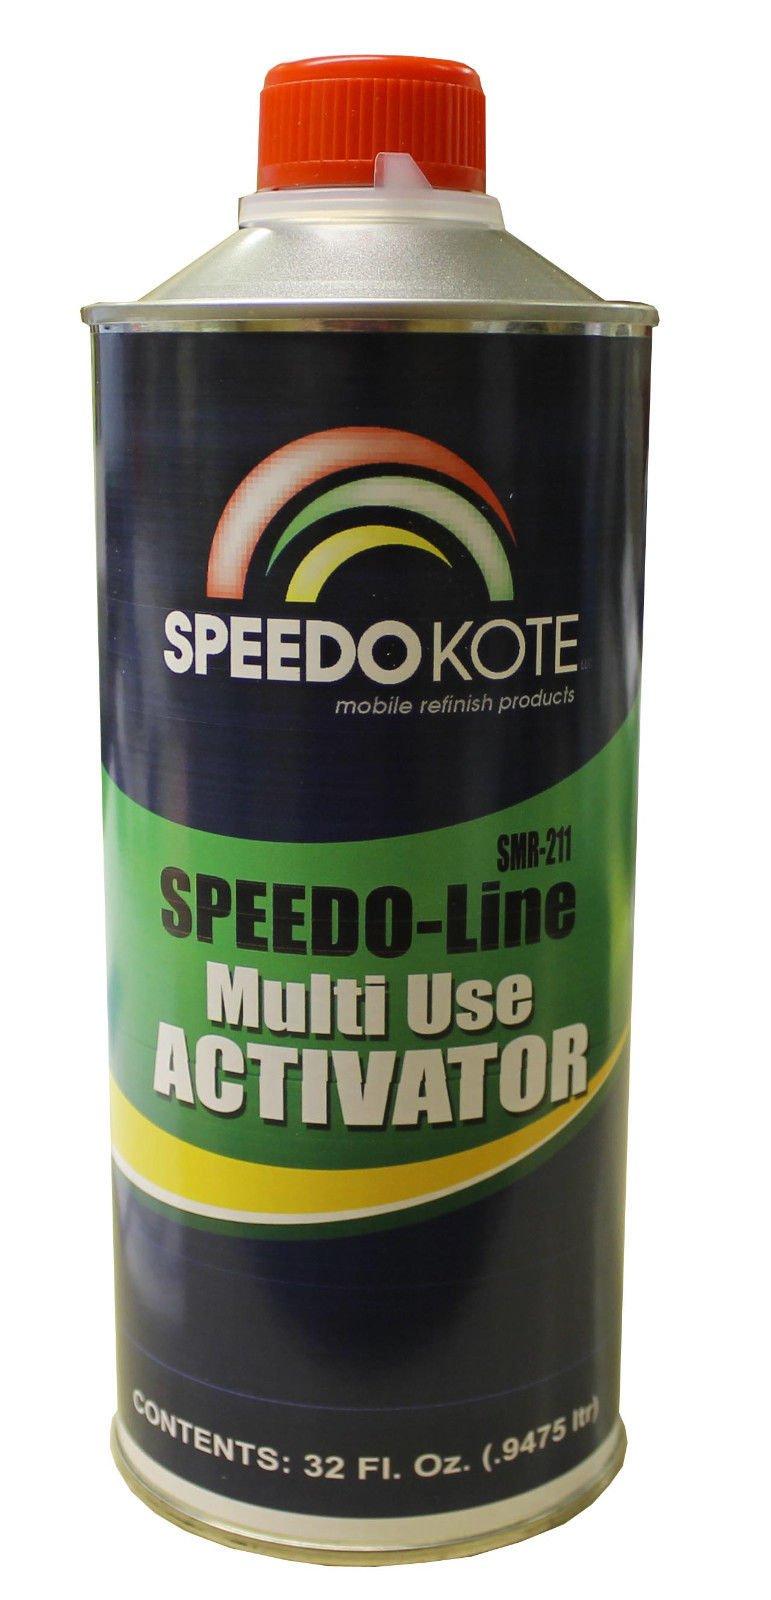 Universal Activator for Speedokote primers, hot rod black, etc, quart SMR-211-Q